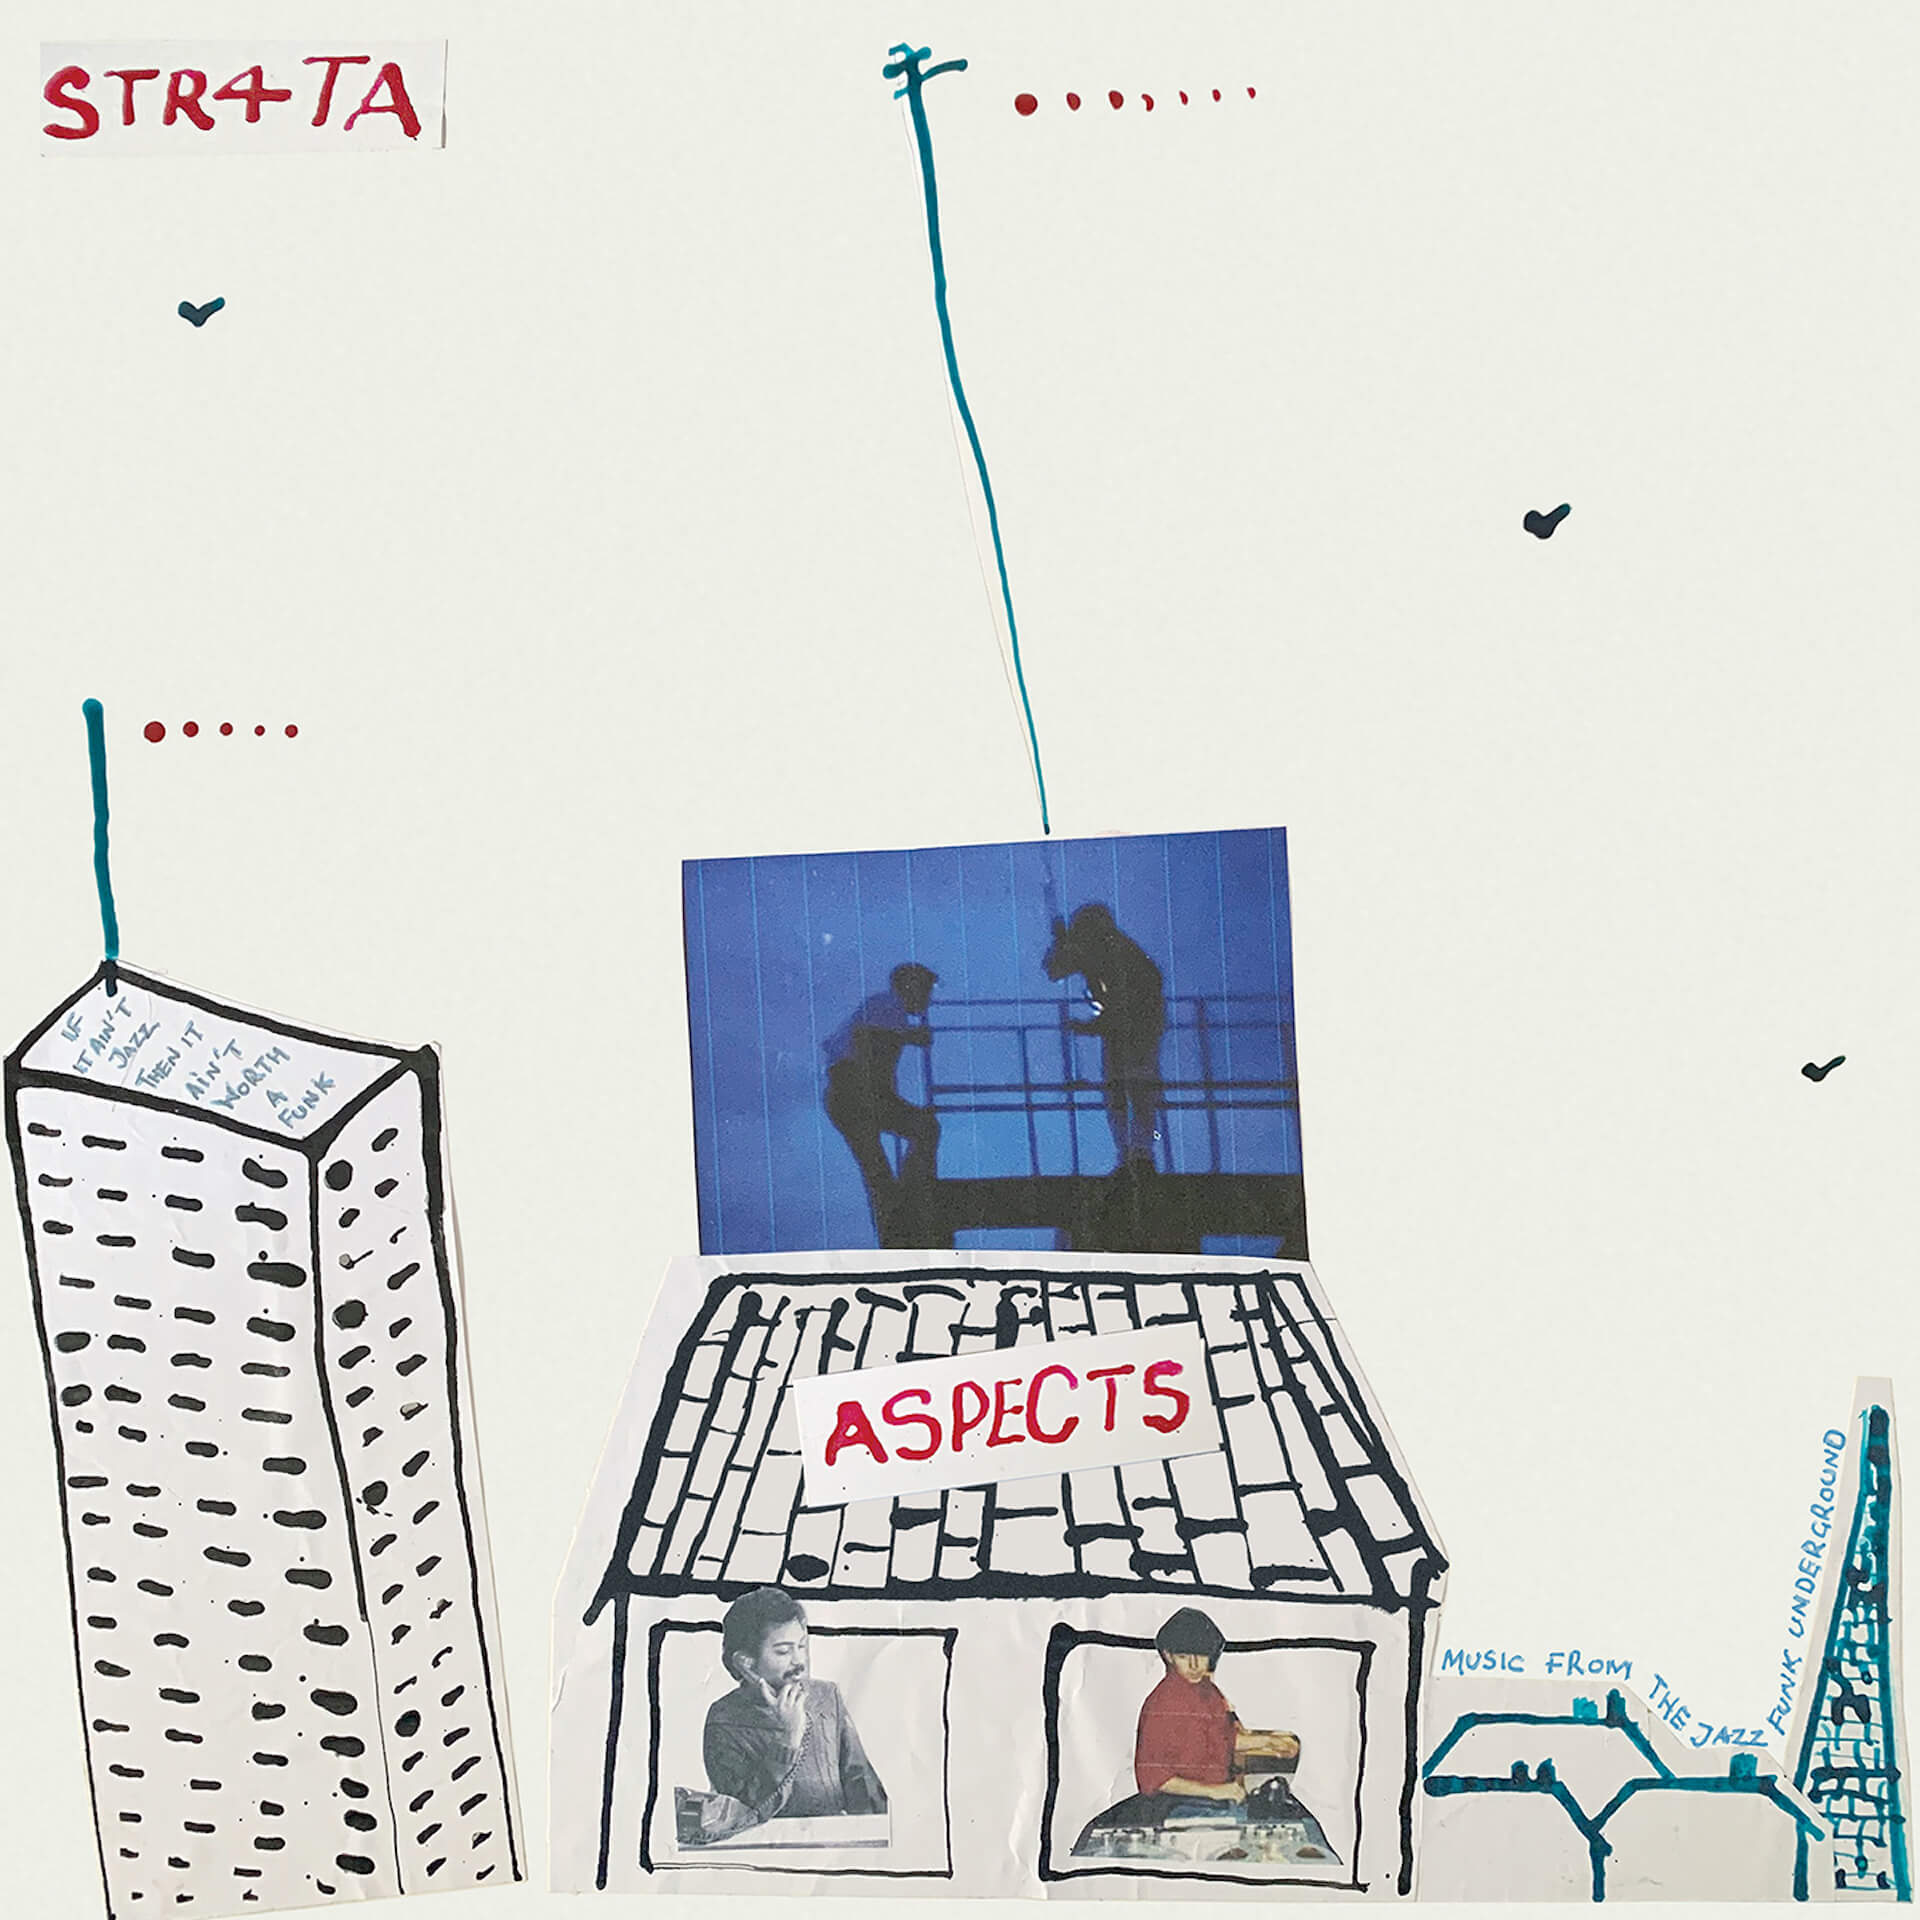 Gilles Peterson、IncognitoのBlueyによる新プロジェクトSTR4TAがアルバム『Aspects』をリリース!先行配信曲を公開 music210112_str4ta-02